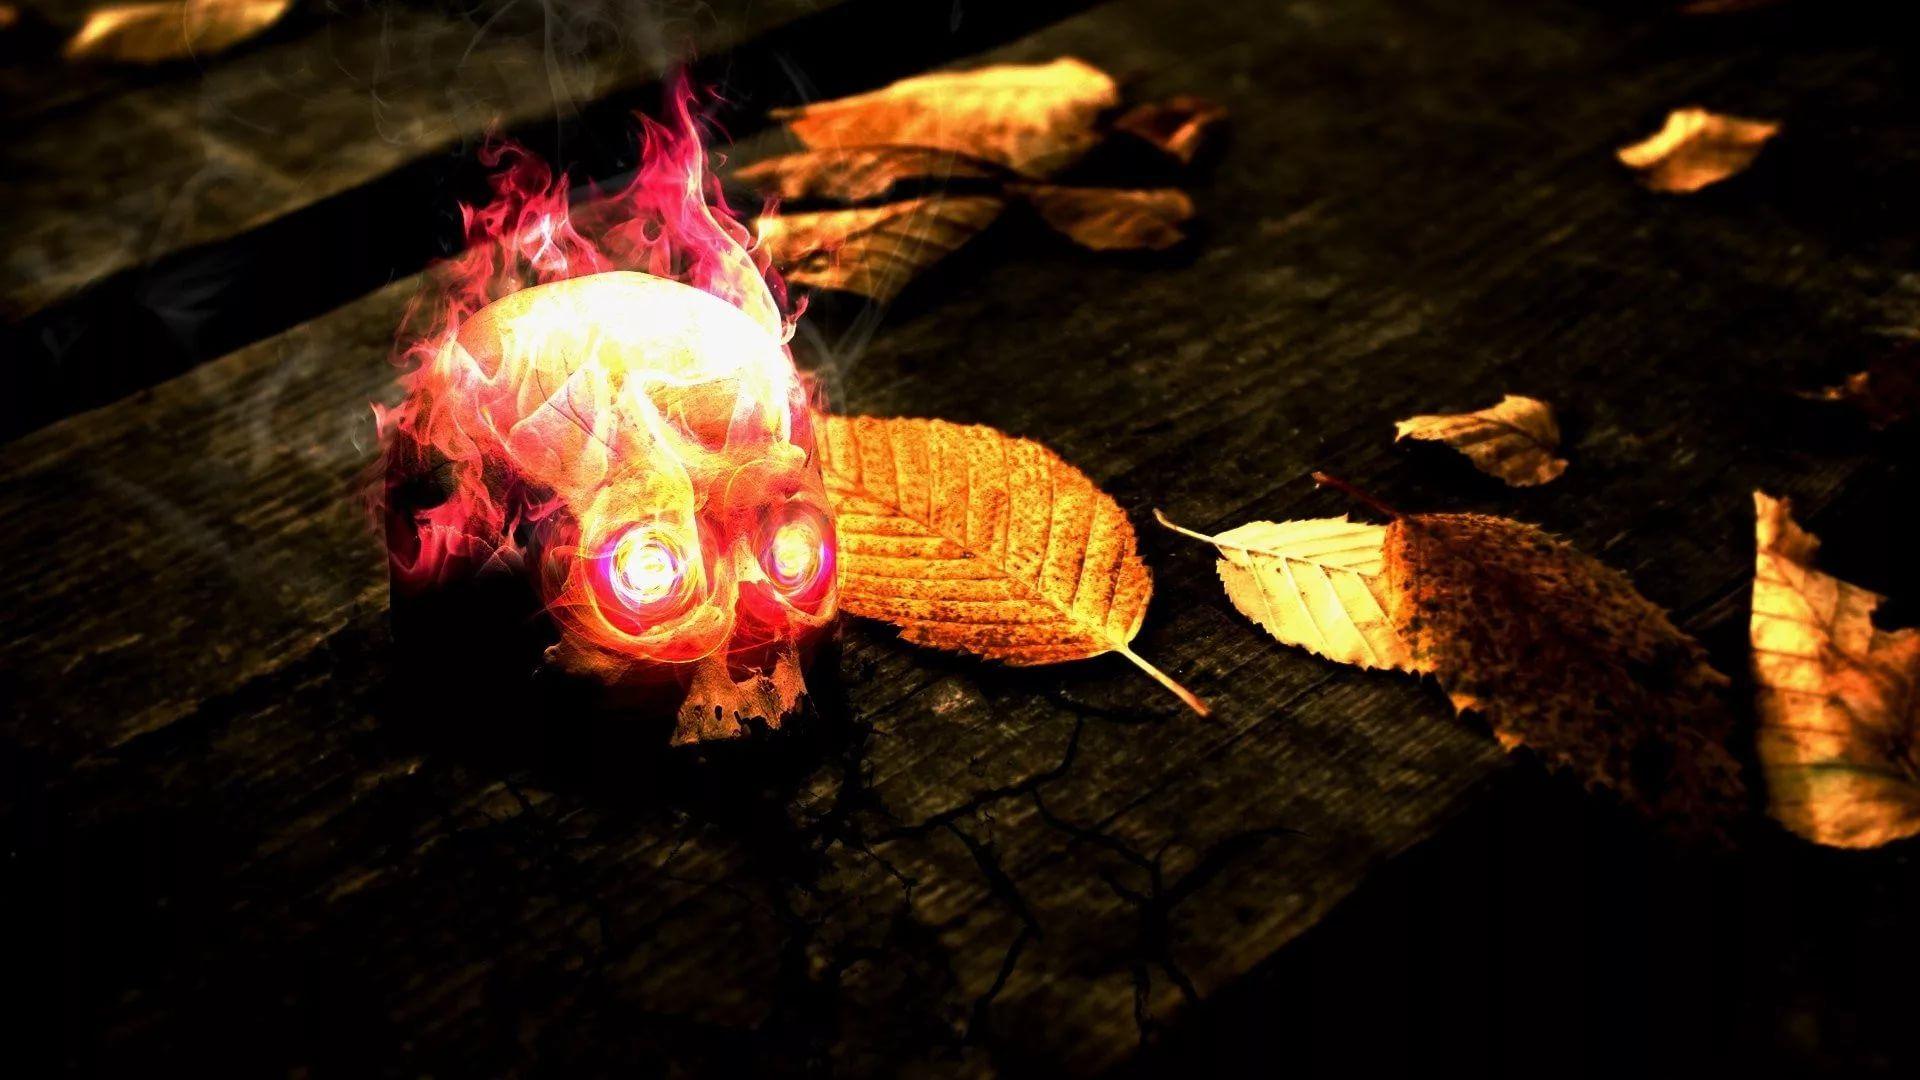 Flaming Skull download wallpaper image